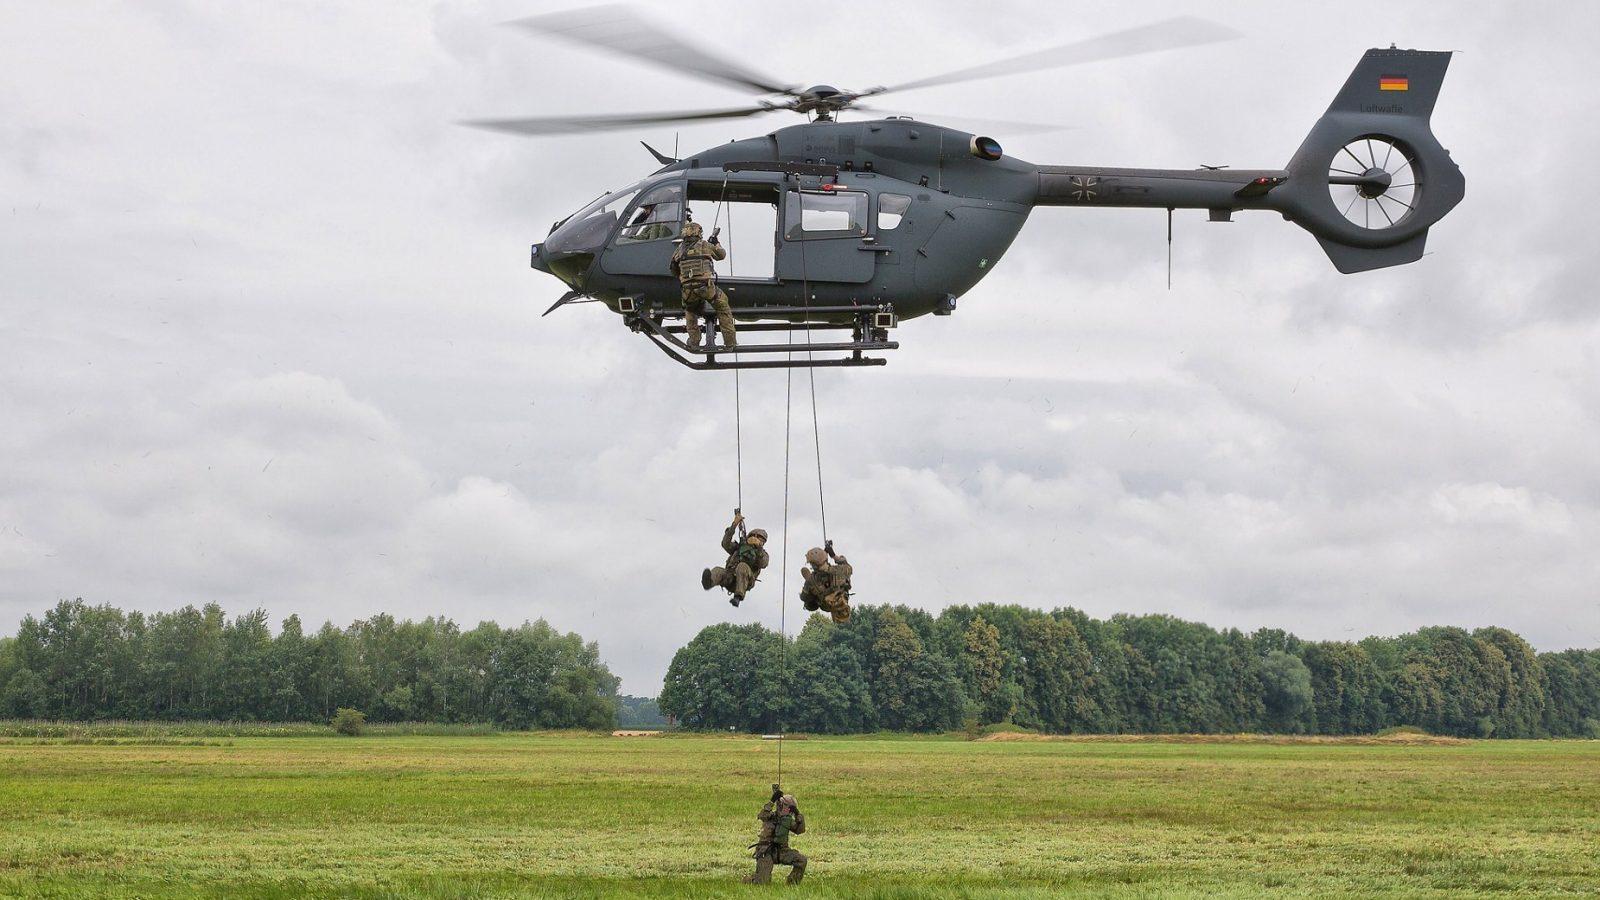 Erbas razvija sistem zaštite helikoptera H145M putem stvaranja dimne zavese